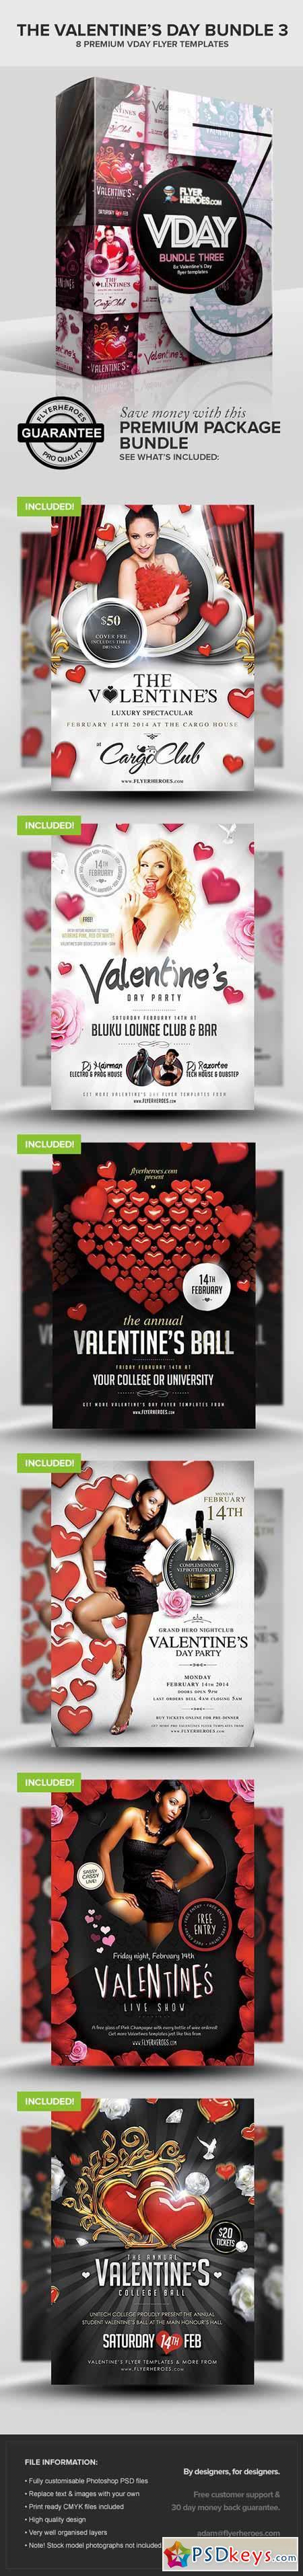 Valentine S Day Bundle 3 Free Download Photoshop Vector Stock